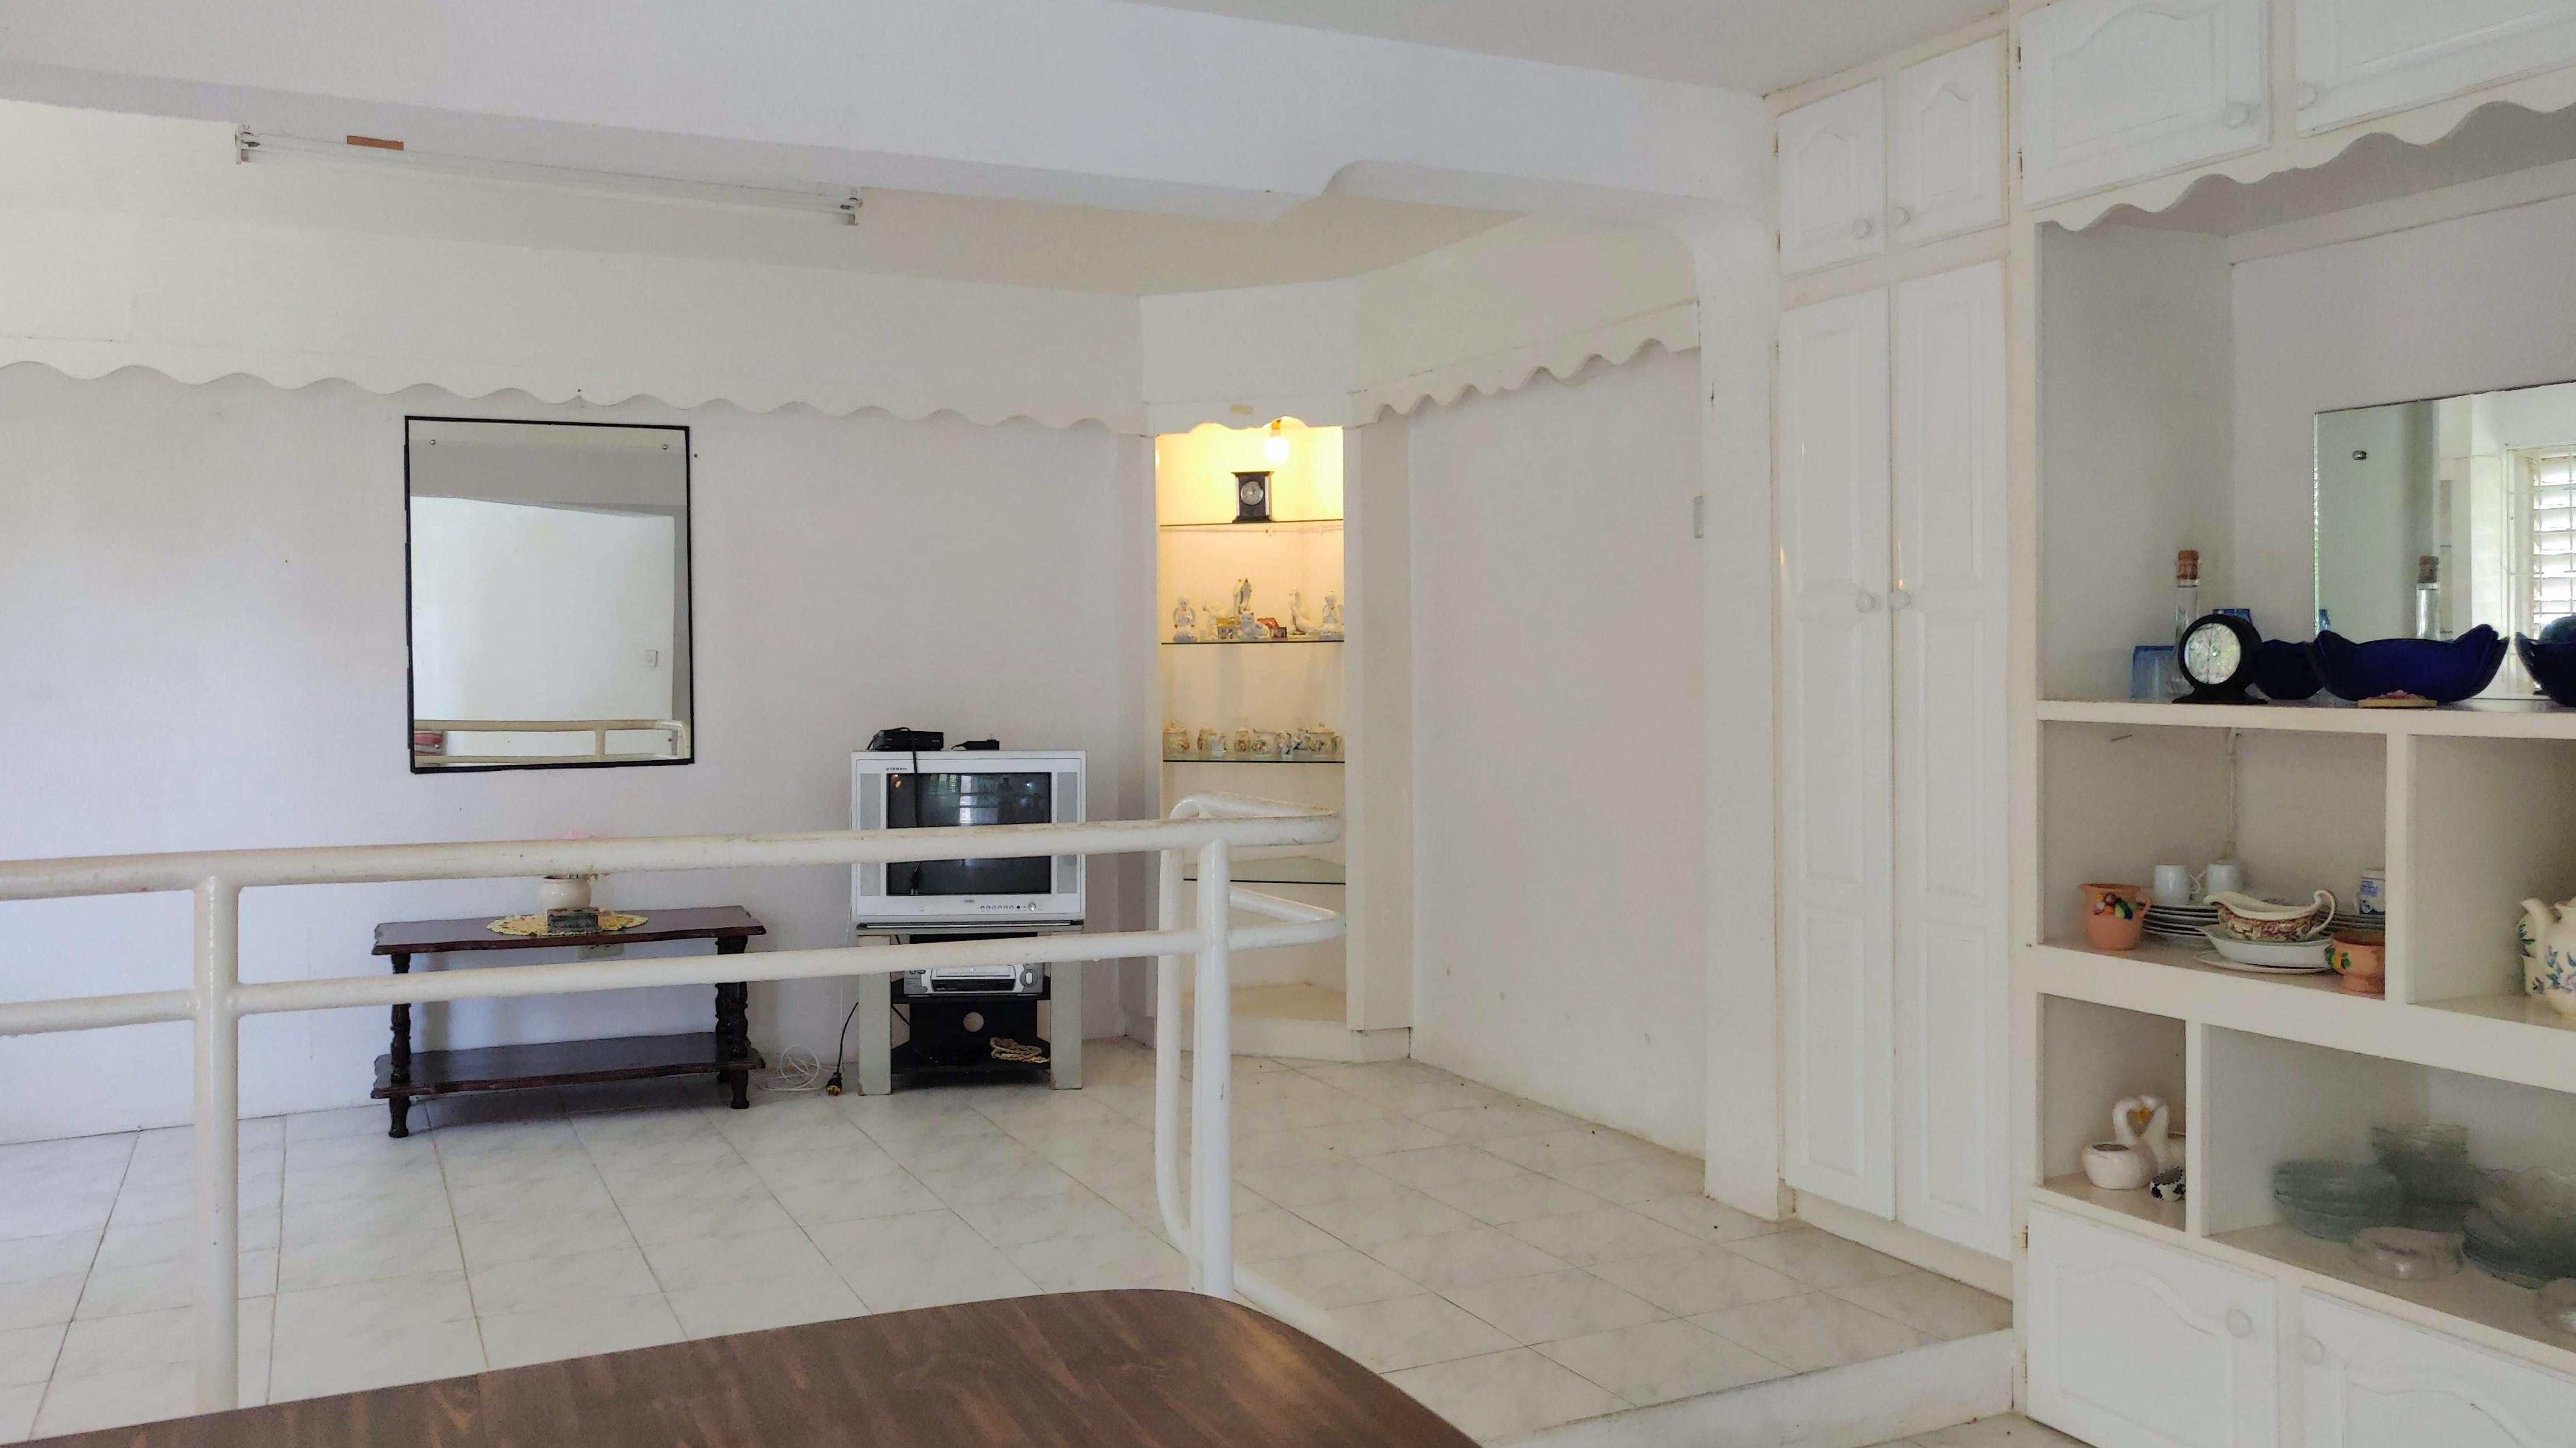 Apartment, Gibbons, Christ Church